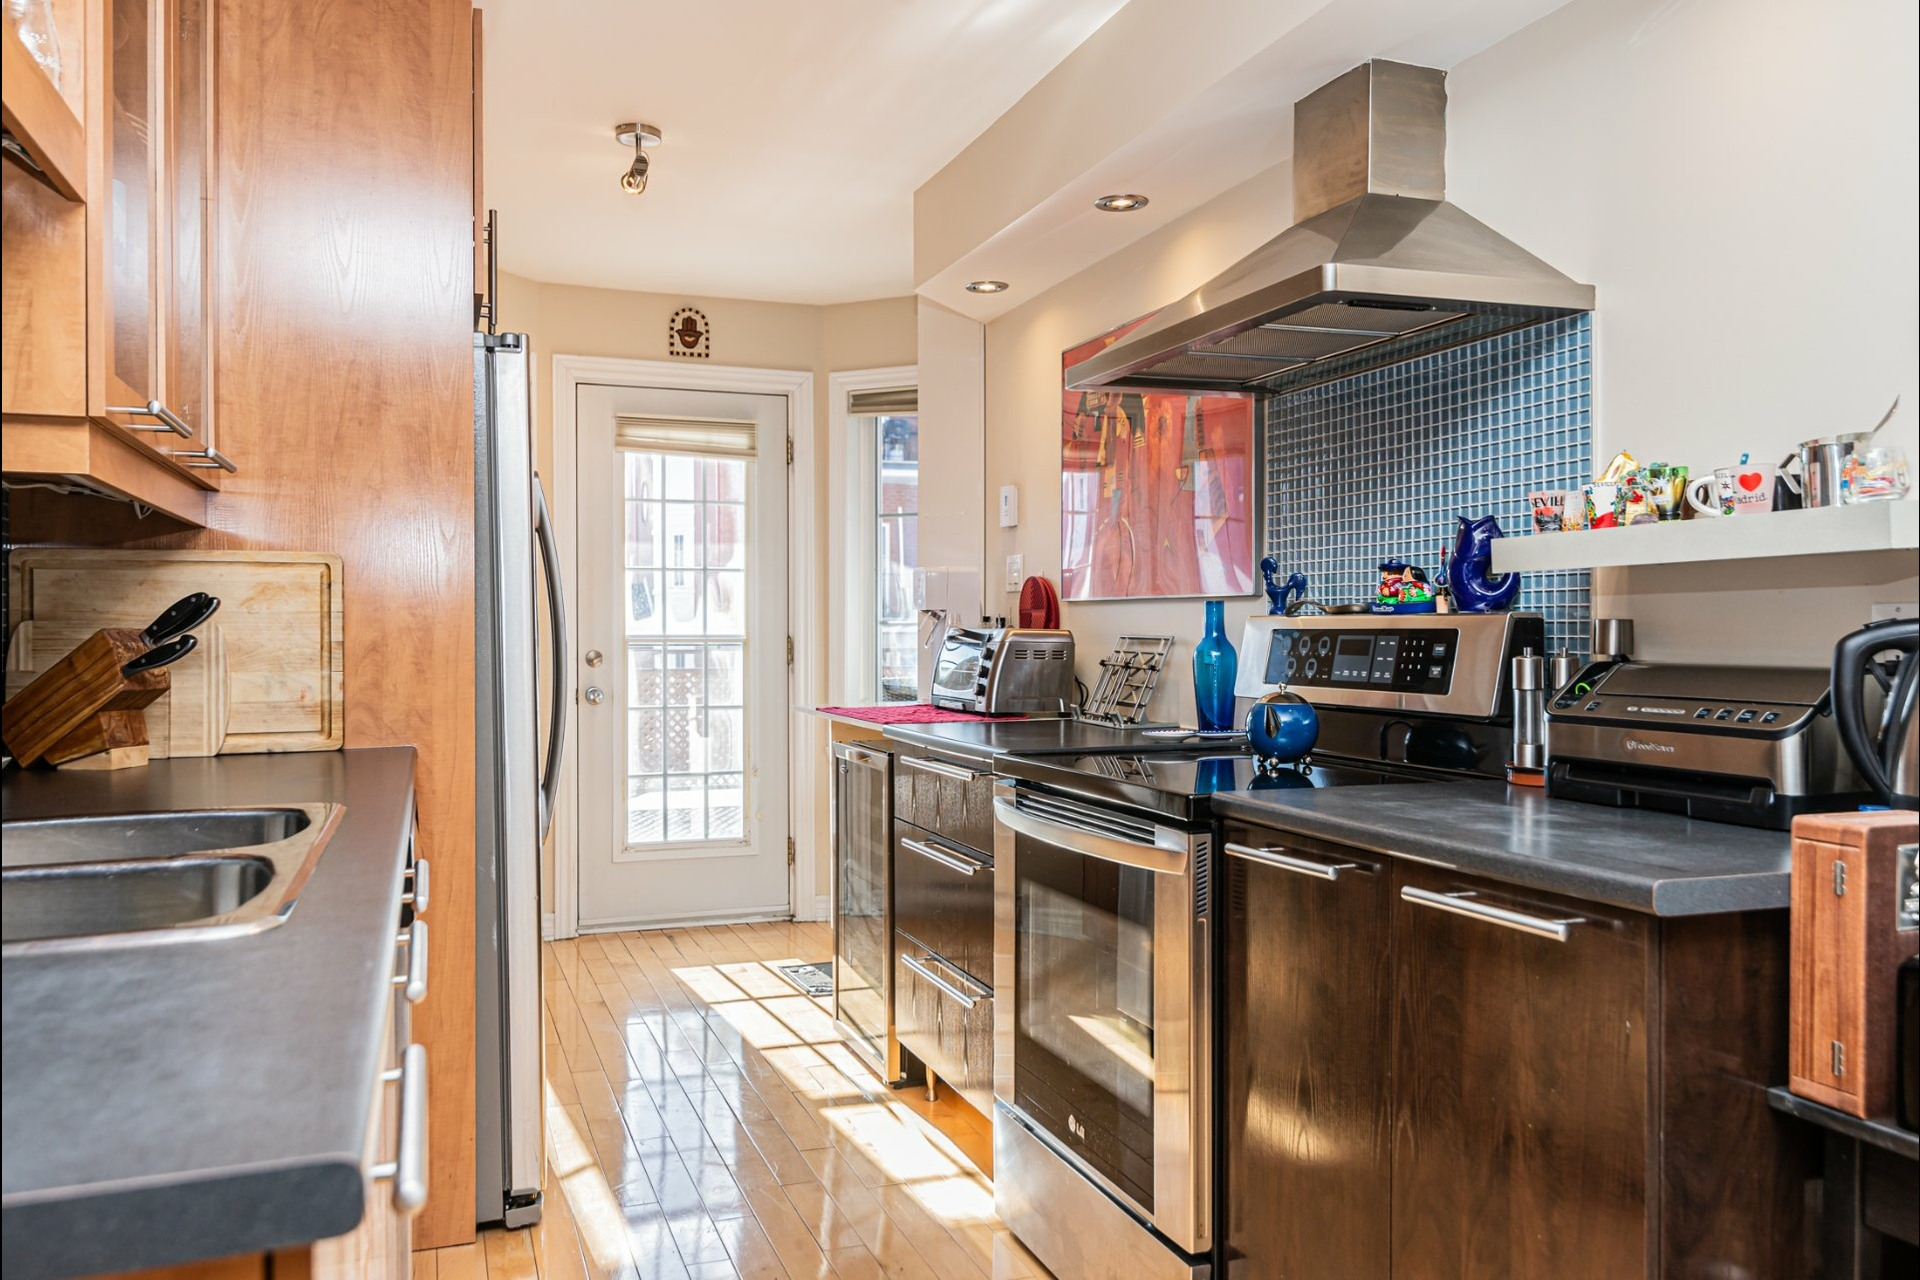 image 7 - Departamento En venta Saint-Laurent Montréal  - 4 habitaciones